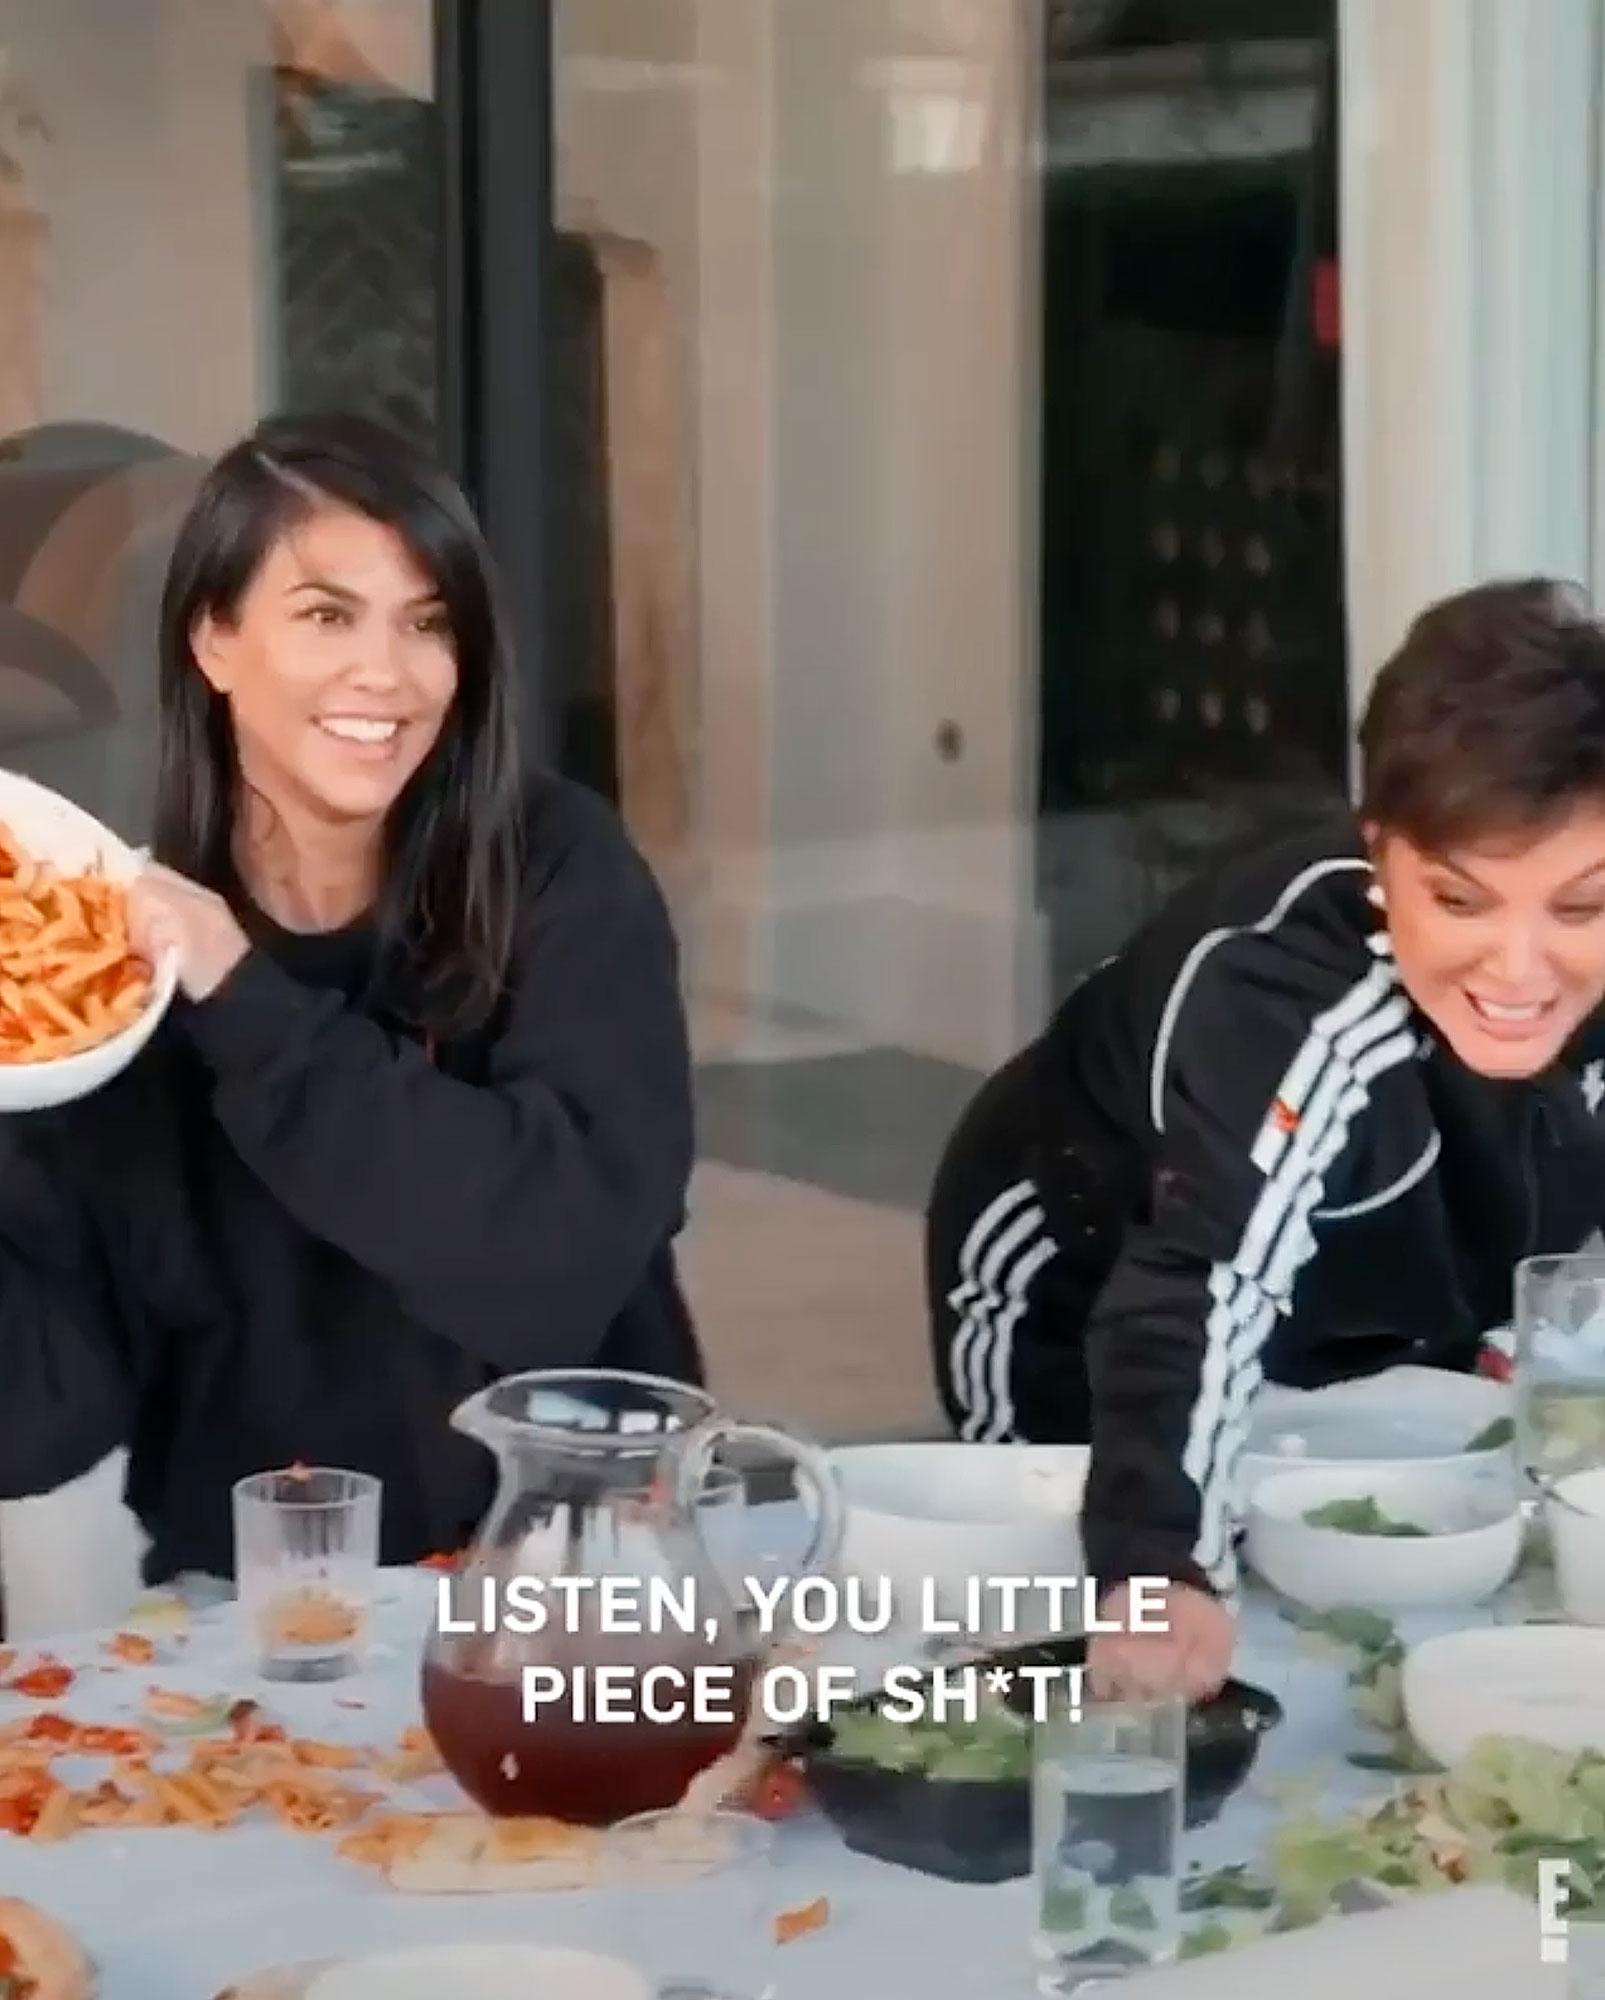 Kim Kardashian Throws a Bowl of Pasta at Khloe in 'Bizarre, Disturbing and Unacceptable' Food Fight